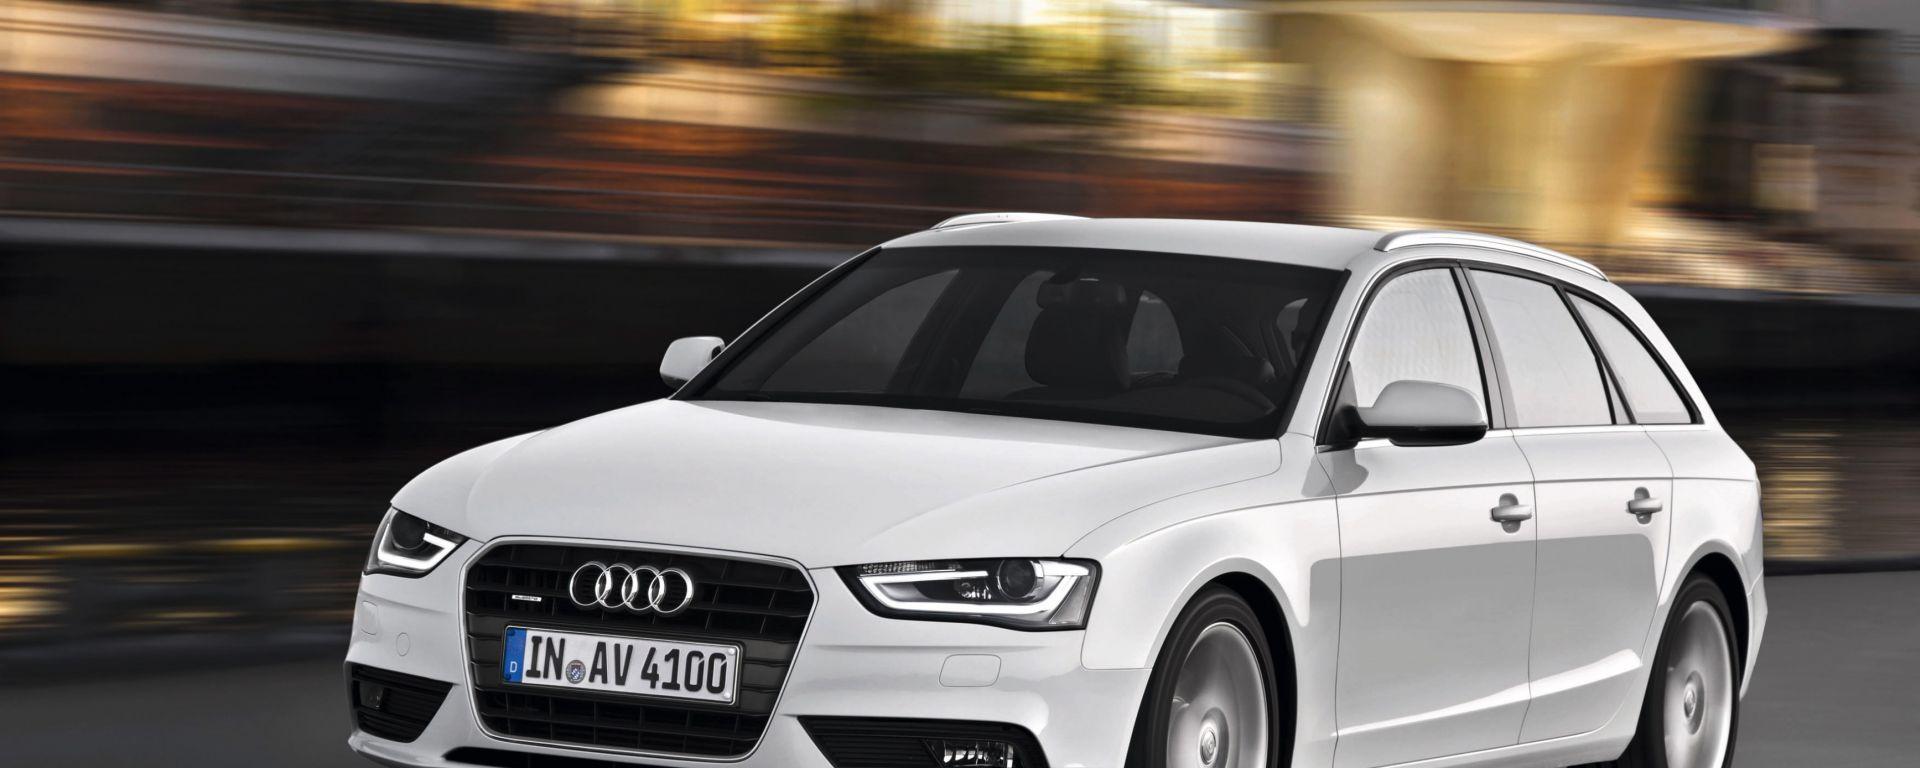 Audi A4 e S4 facelift 2012